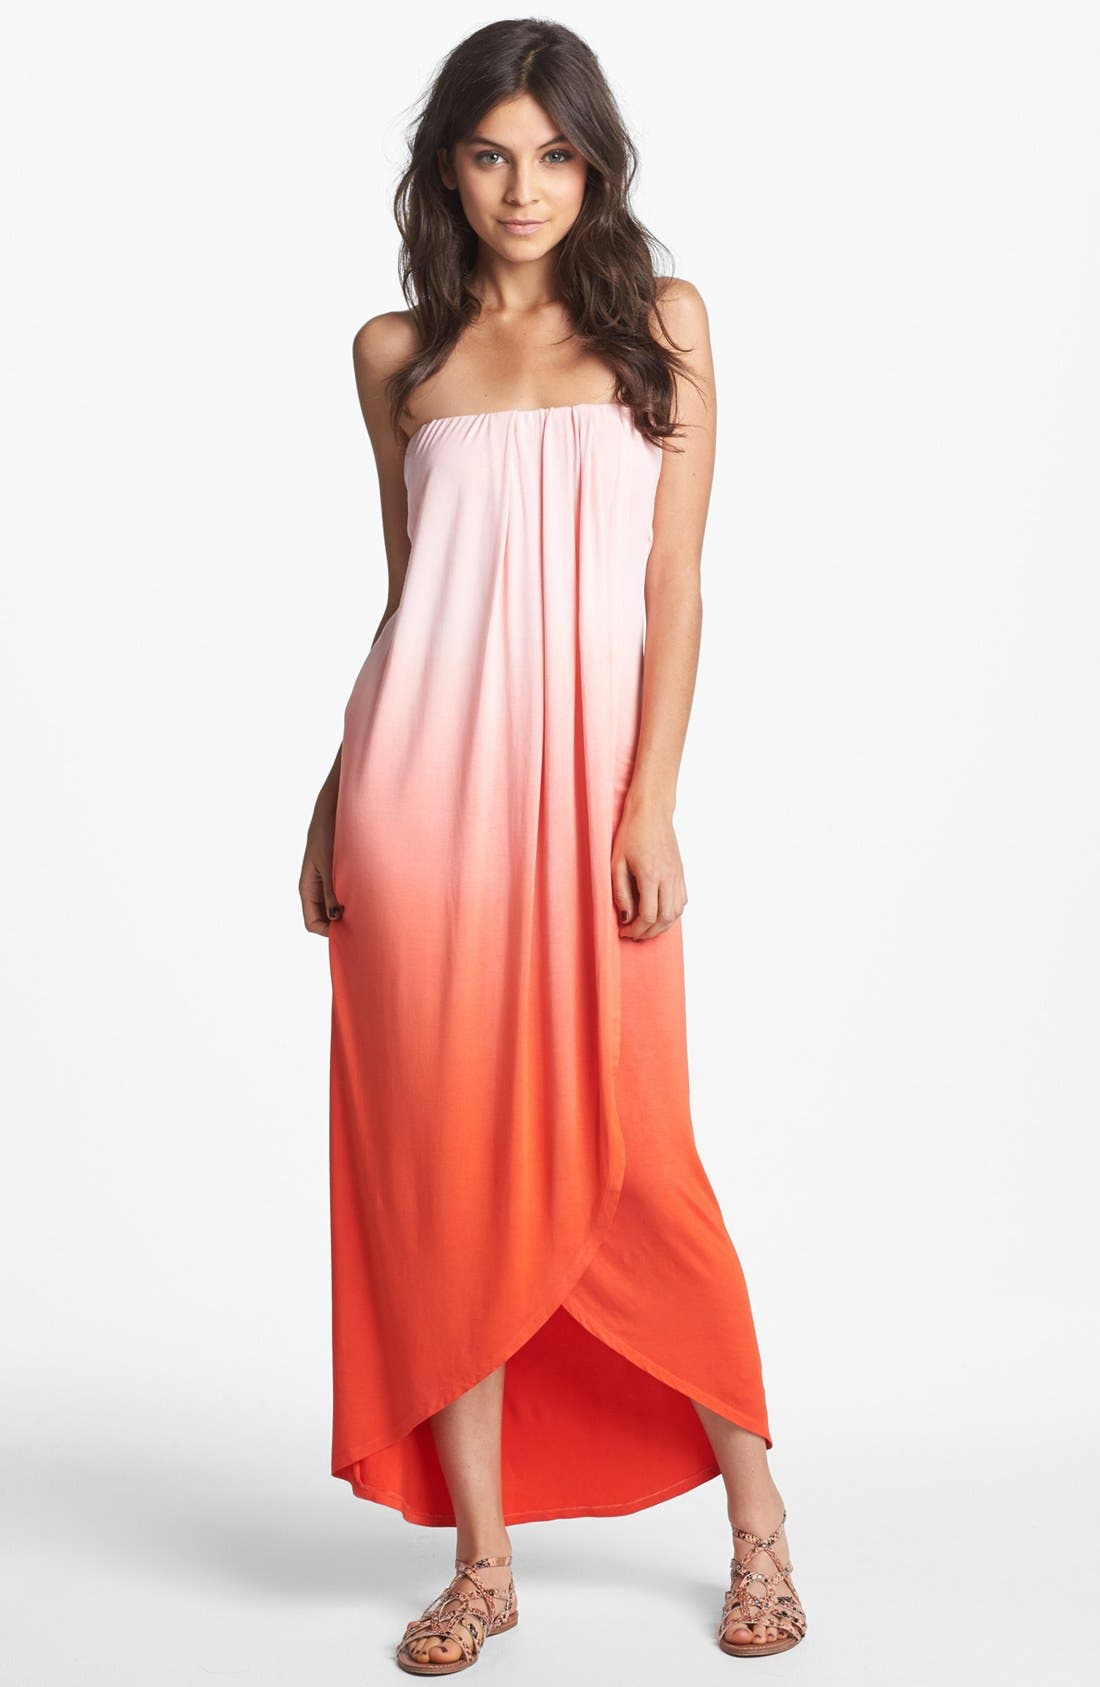 Alternate Image 1 Selected - Young, Fabulous & Broke 'Brooklyn' Ombré Maxi Dress